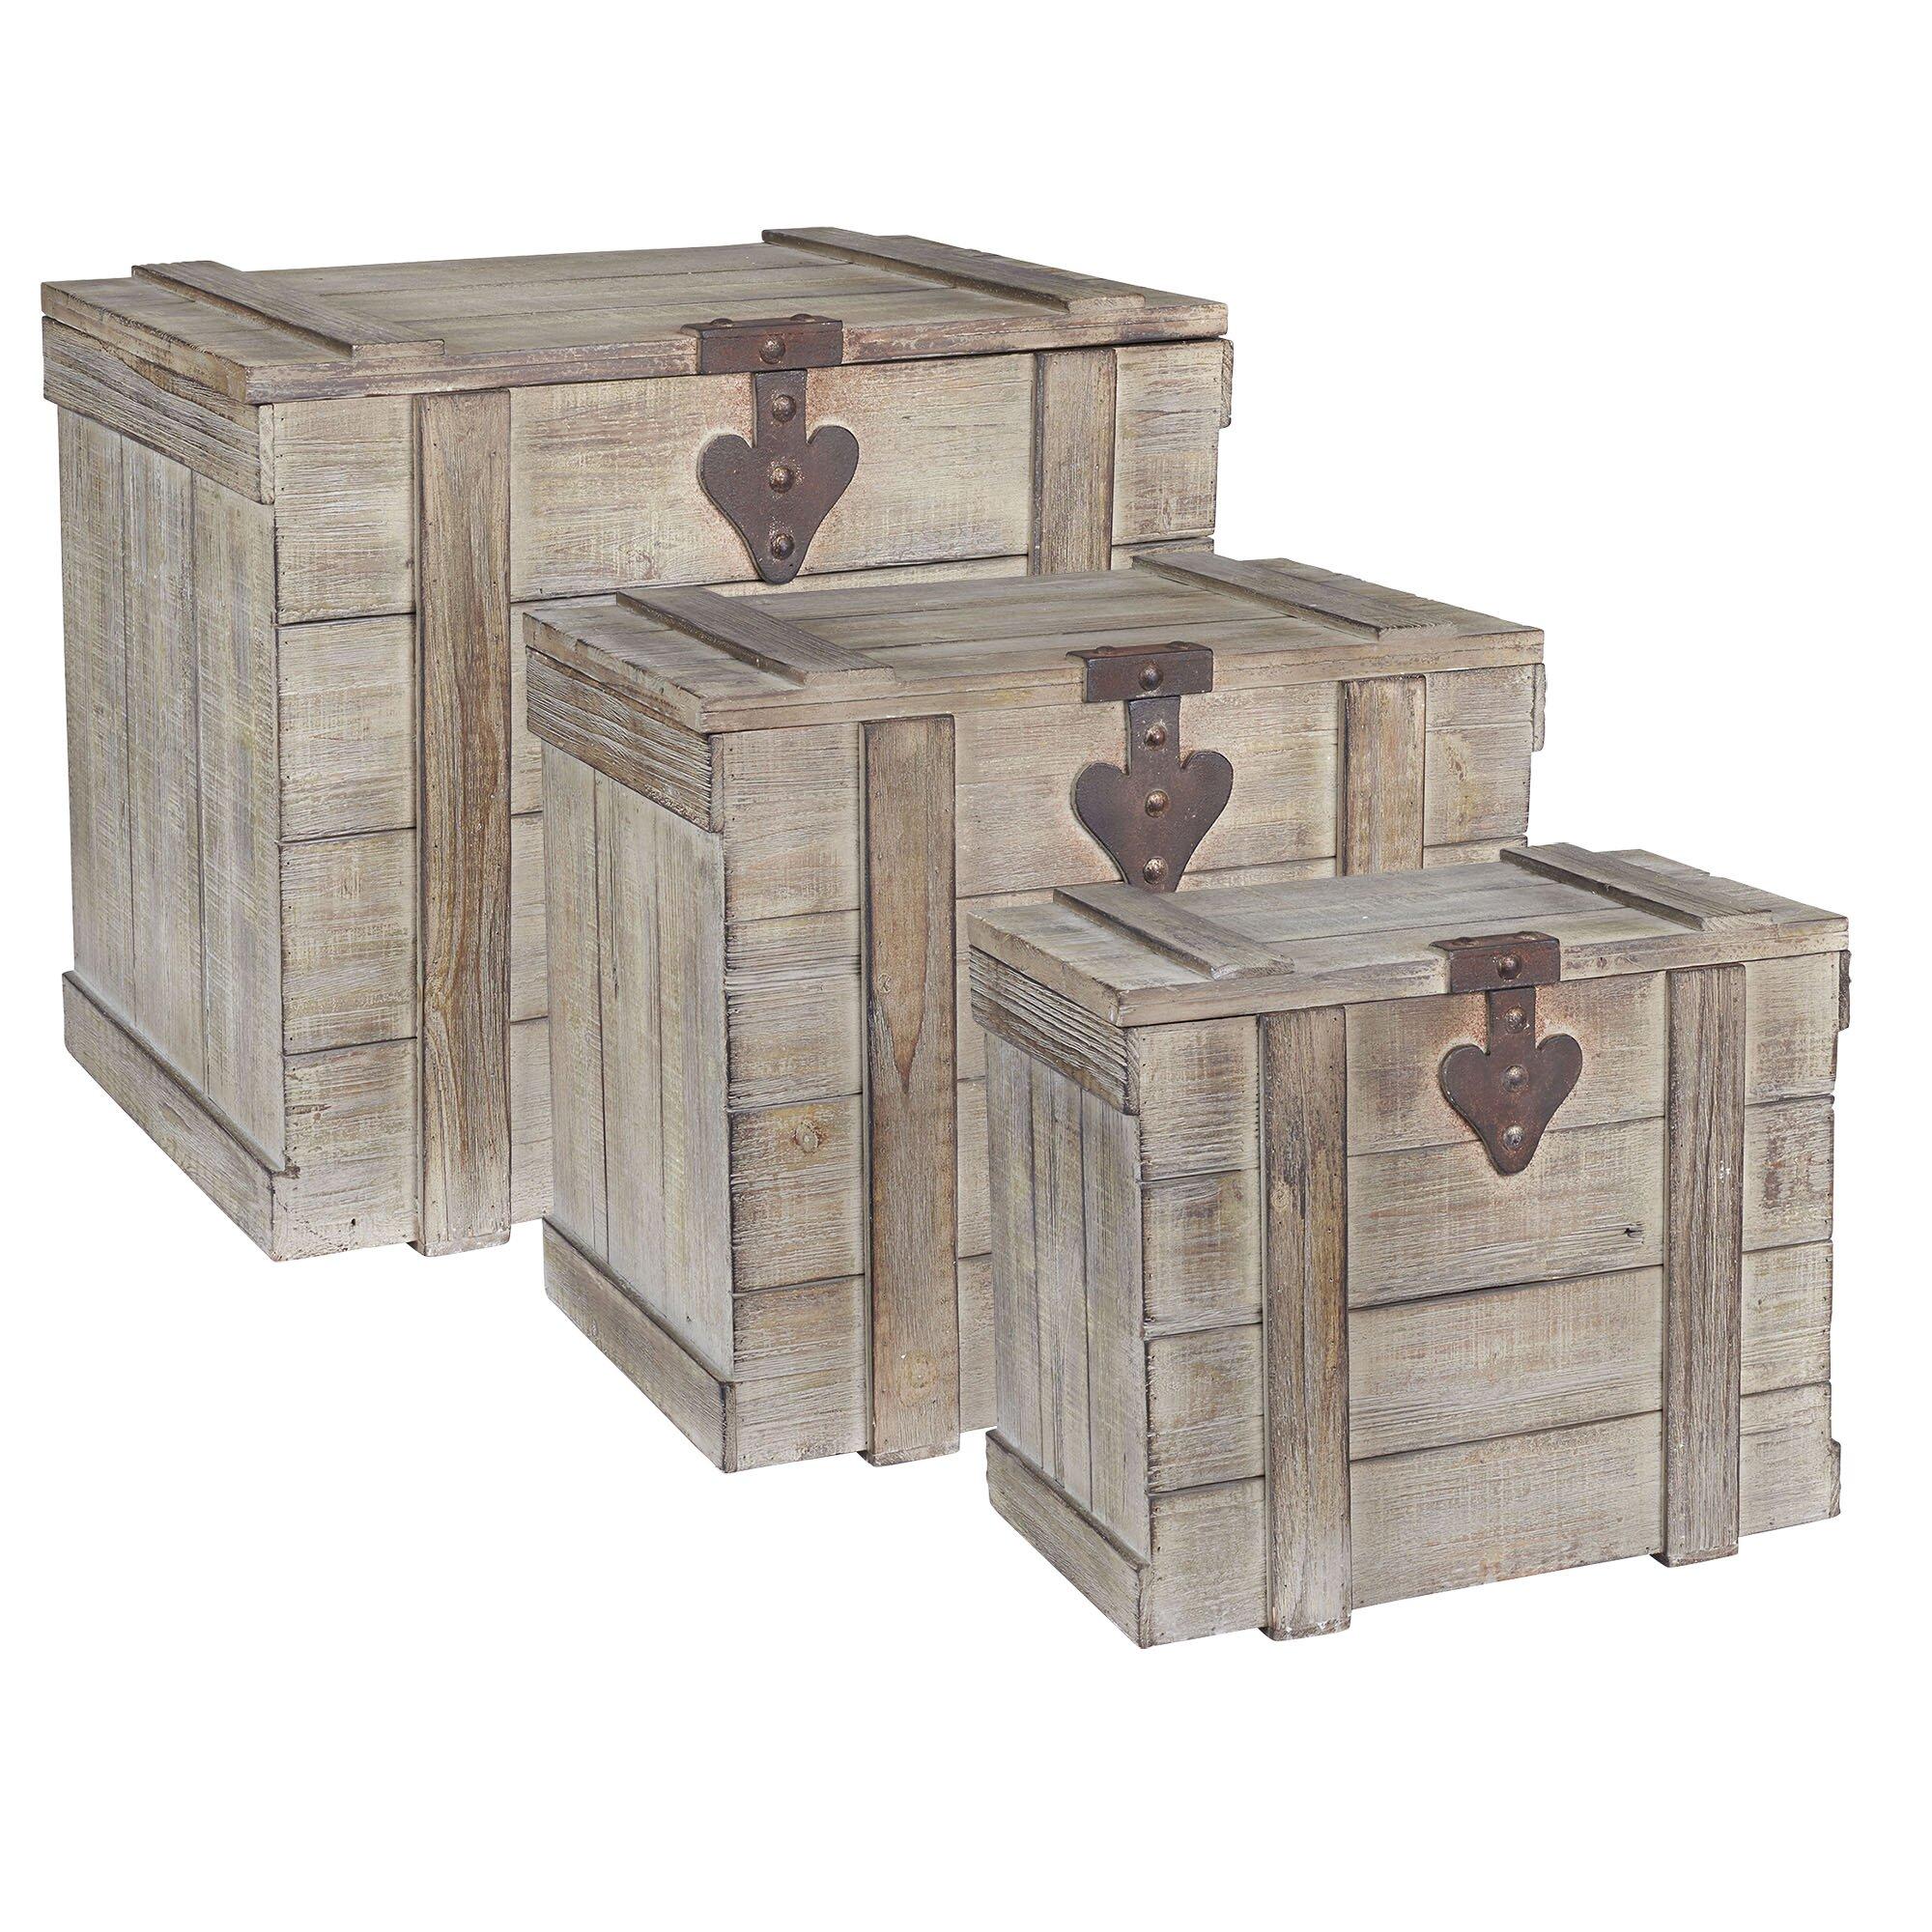 3 piece wooden home chest set